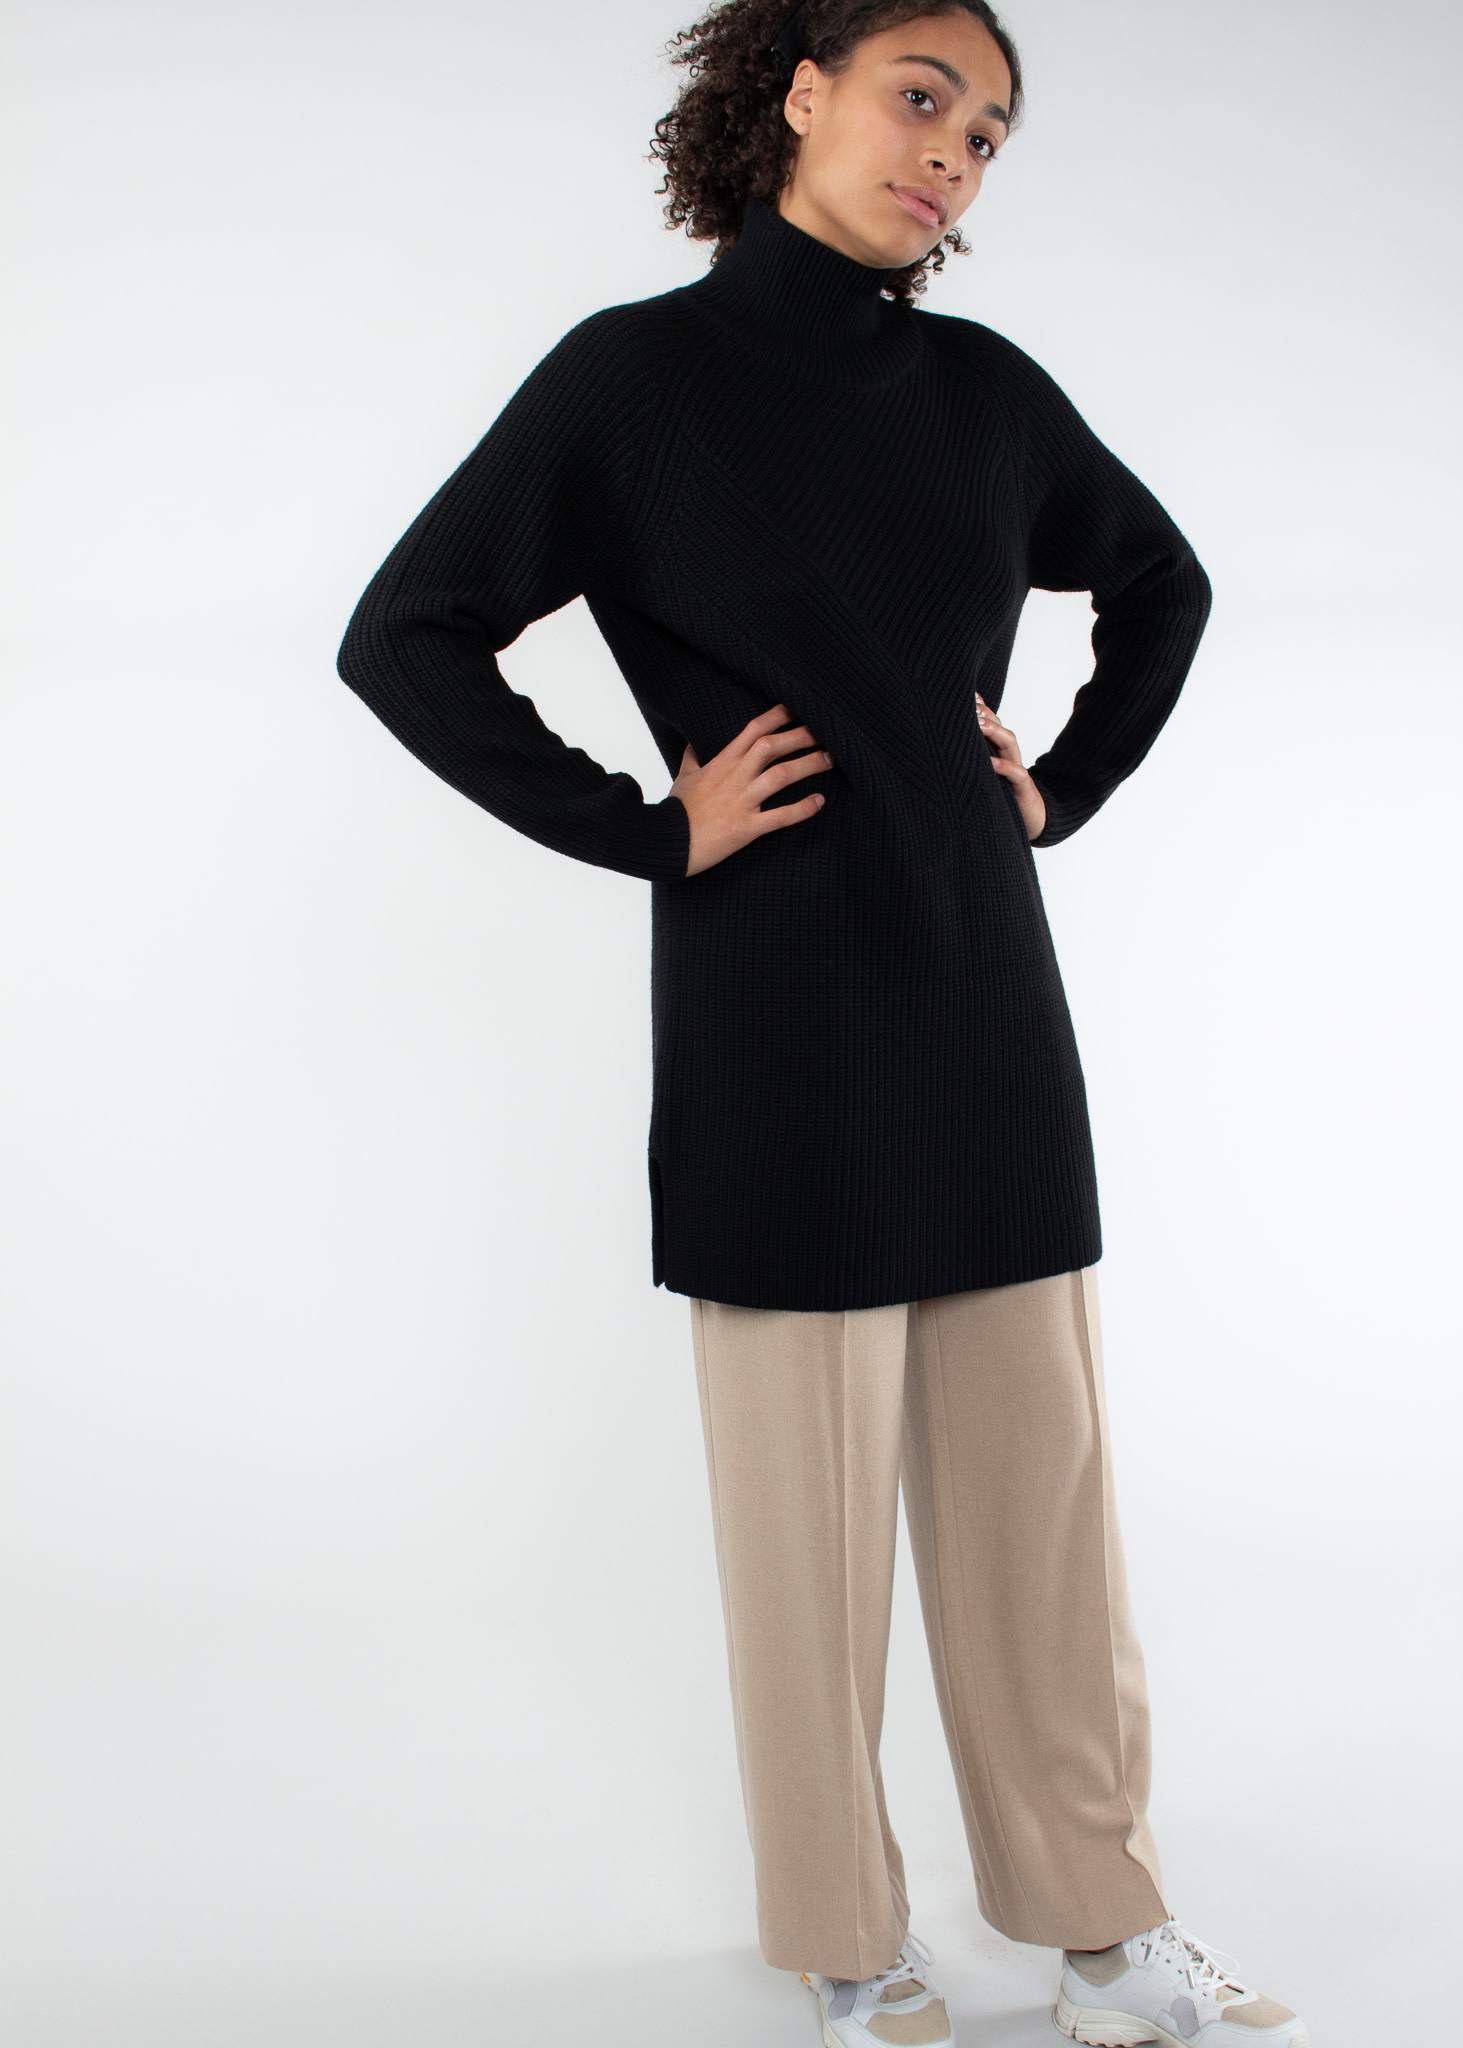 REPEAT 300166 - Robe laine merino